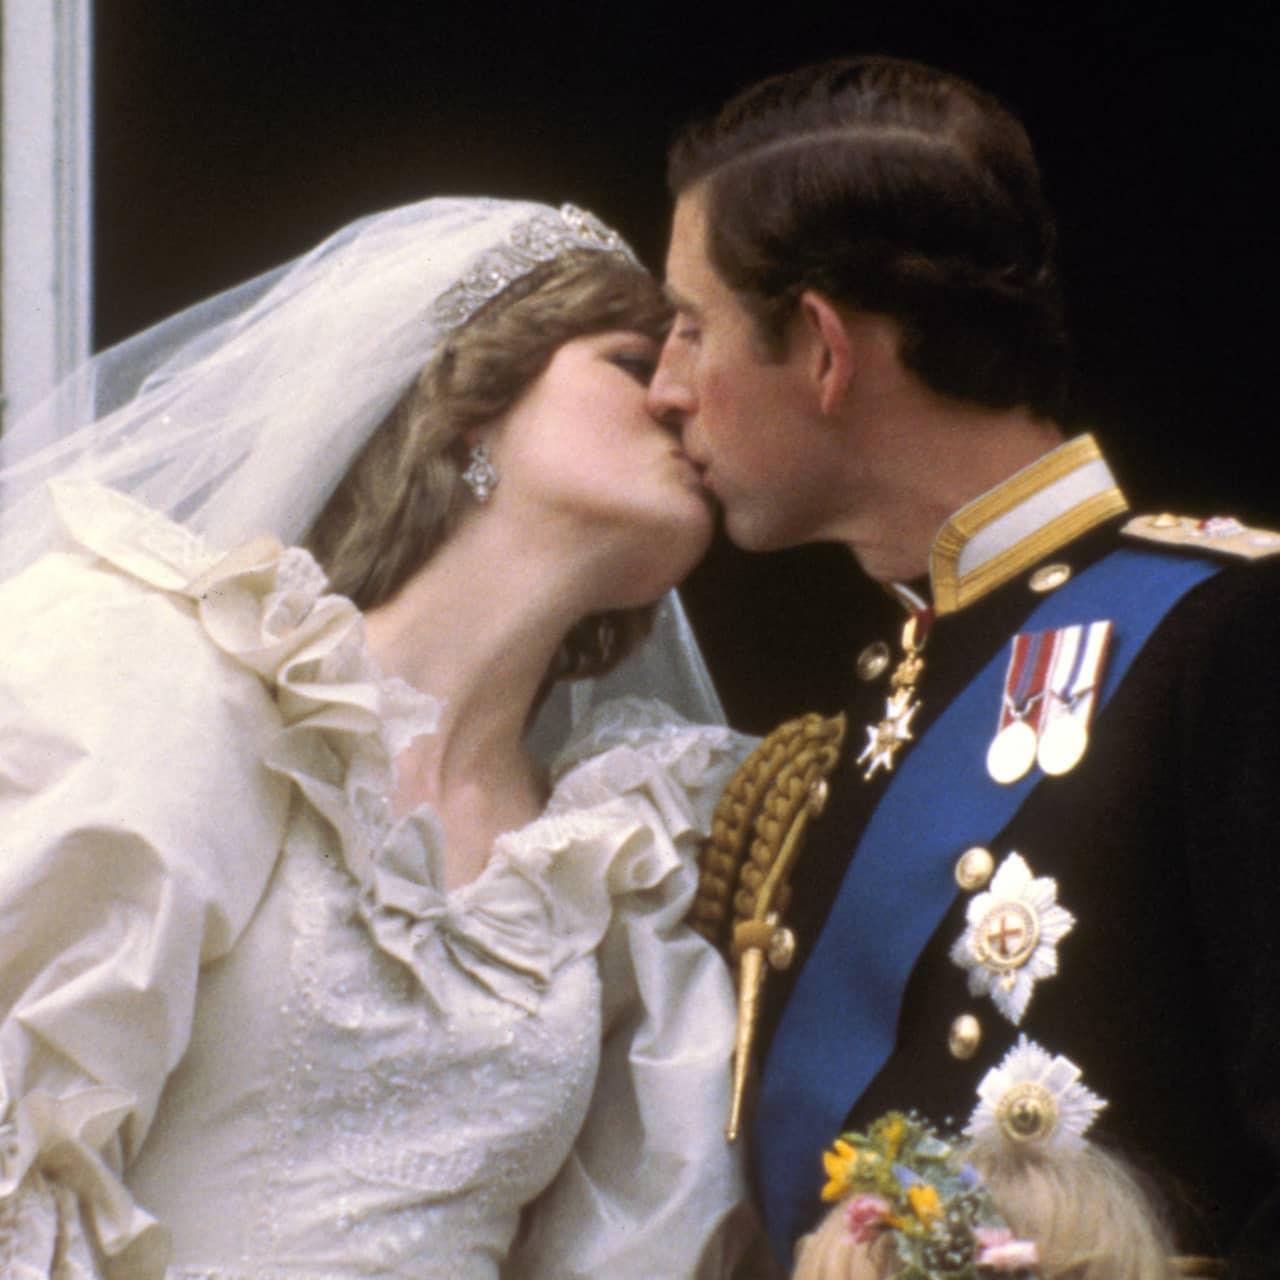 700 miljoner följer sagobröllopet